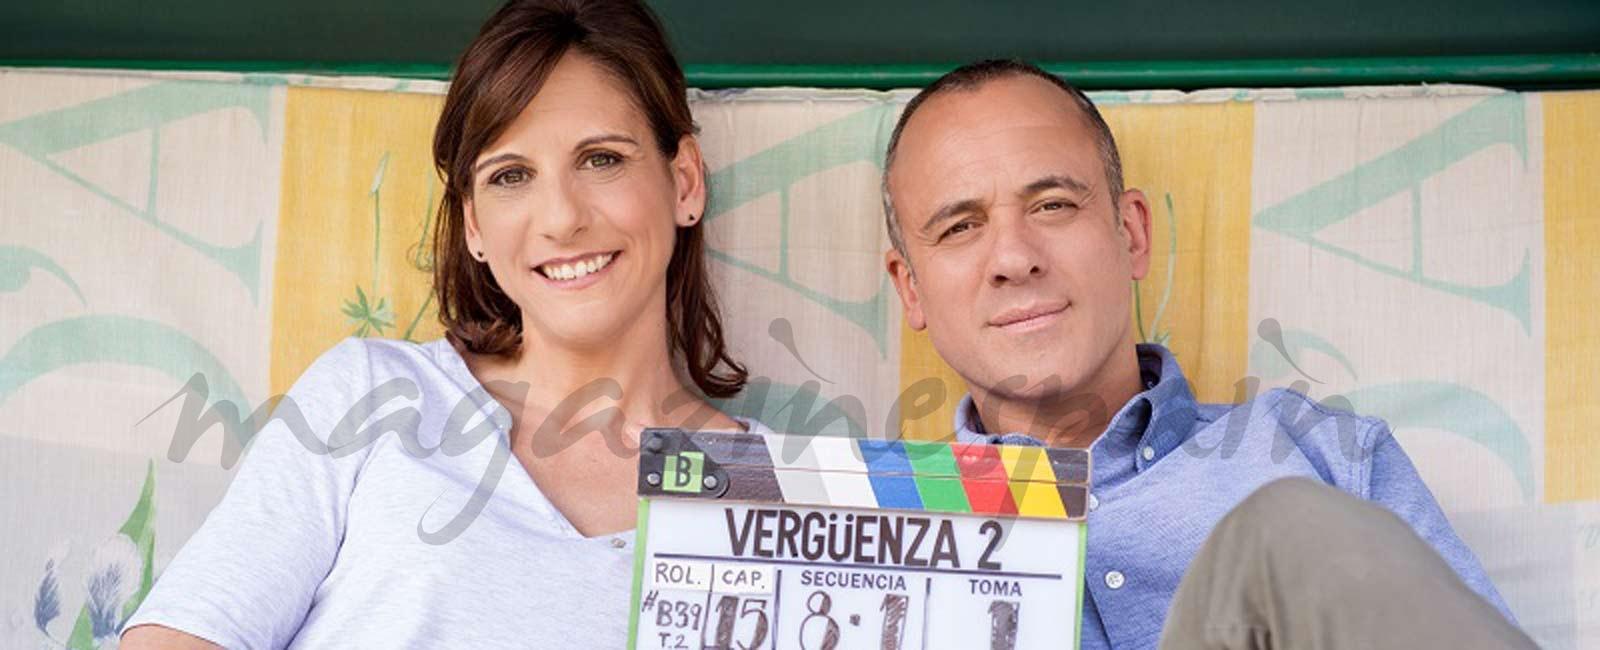 Así ha sido la primera semana de rodaje de  la segunda temporada de 'Vergüenza'